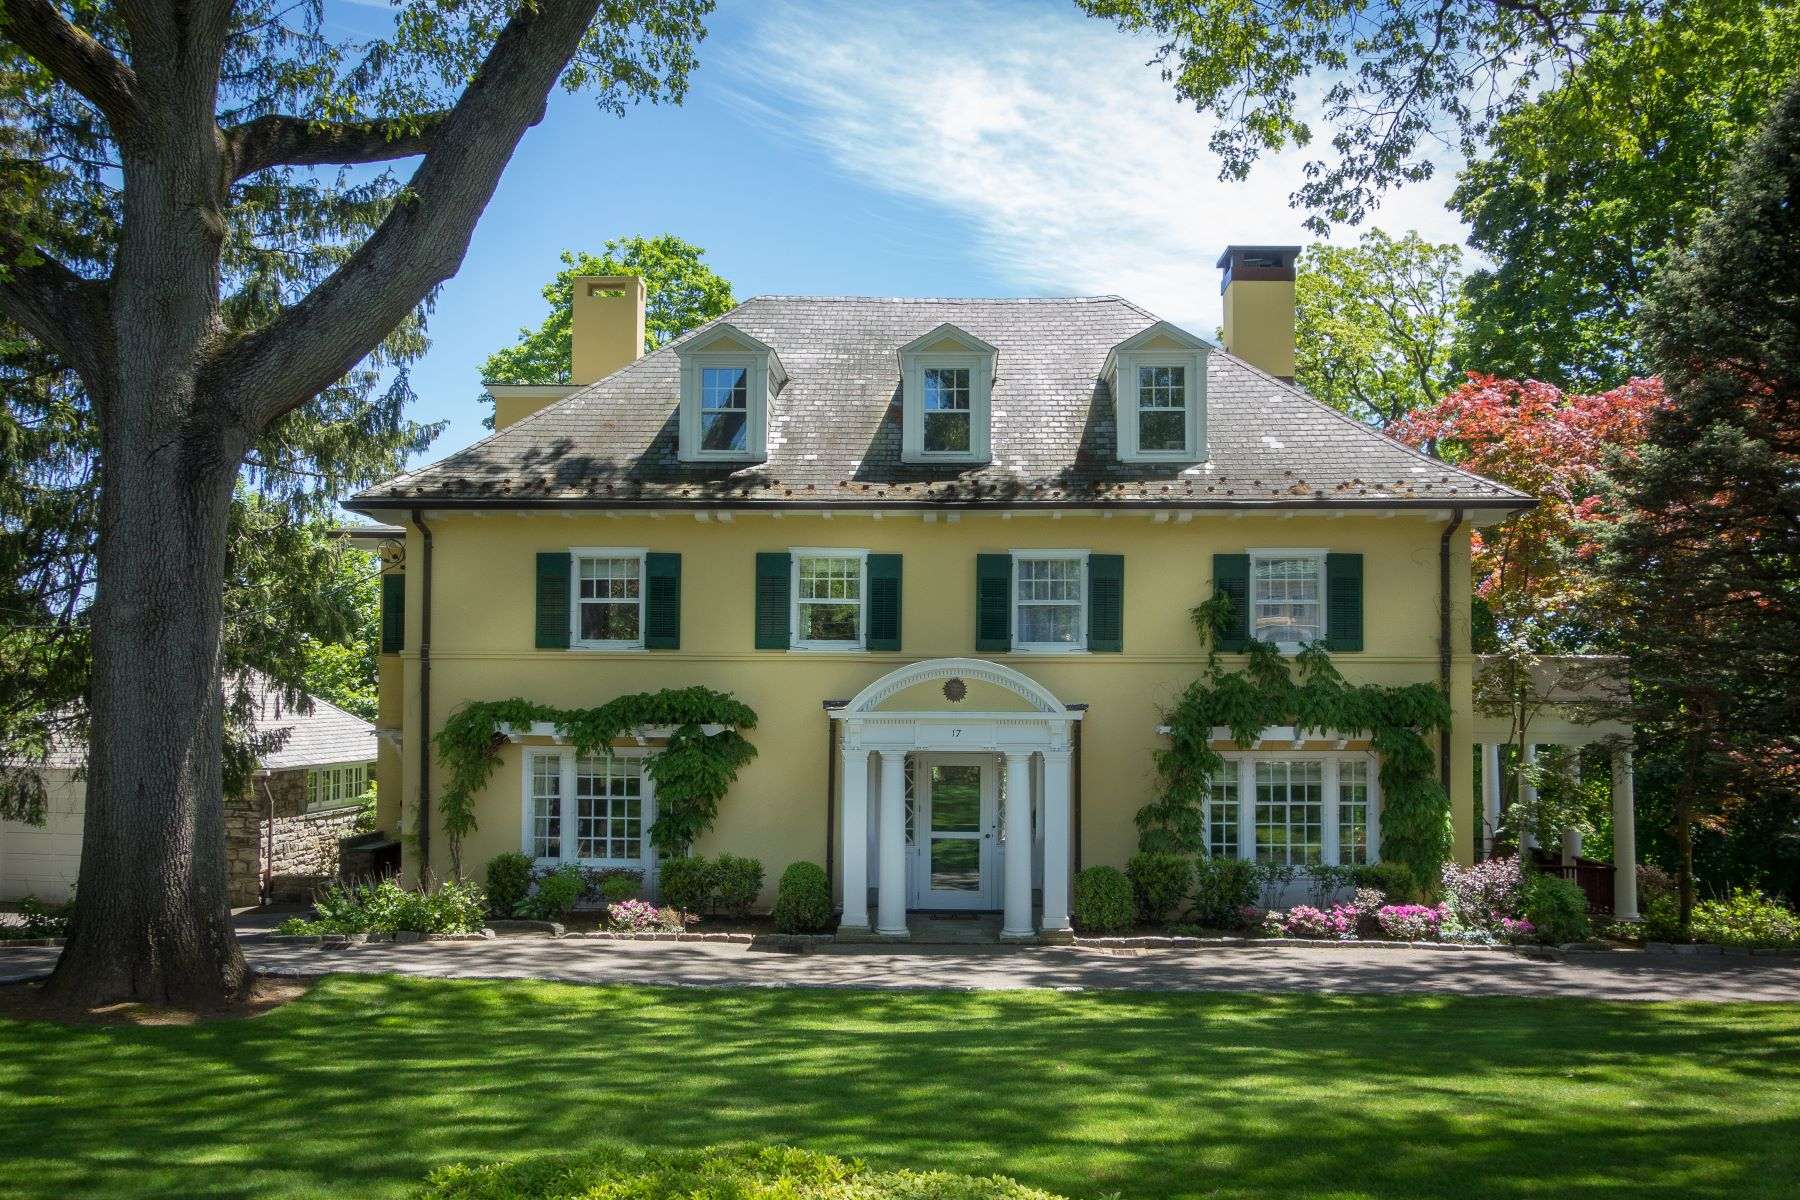 Single Family Homes для того Продажа на Welcome To 17 Ridge Road 17 Ridge Road Bronxville, Нью-Йорк 10708 Соединенные Штаты